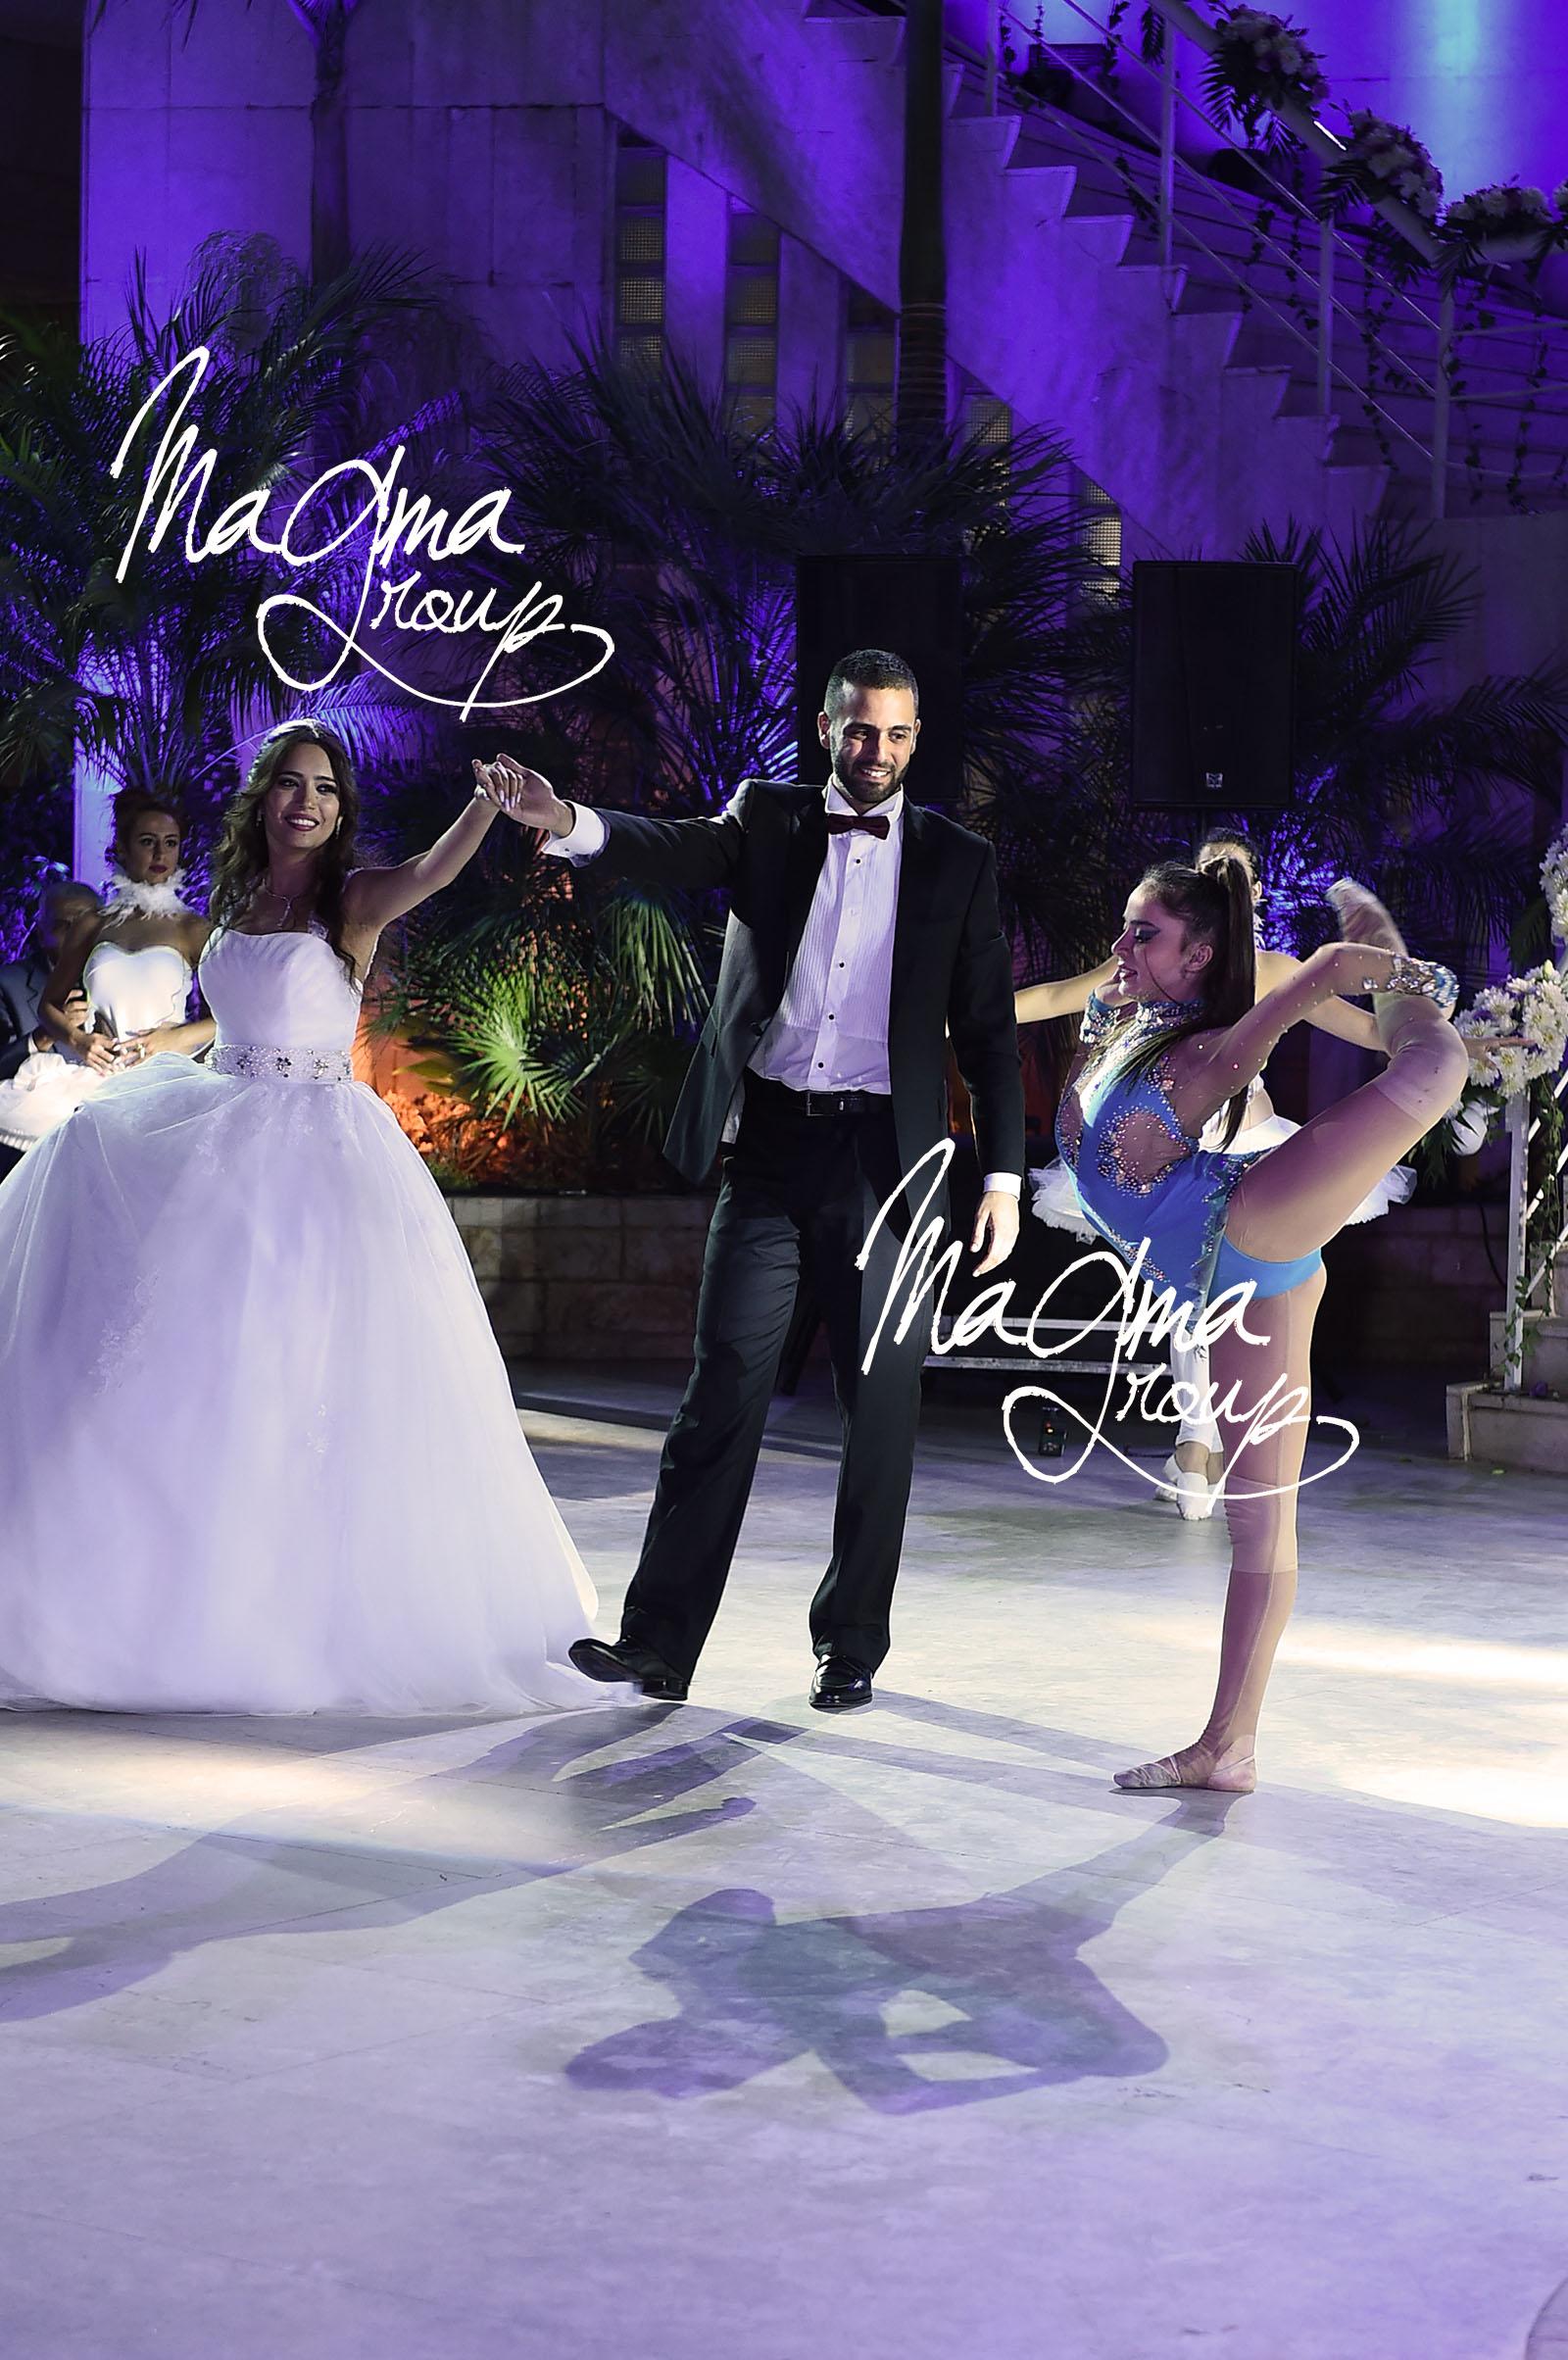 magma-group-clasical-wedding-new-theme